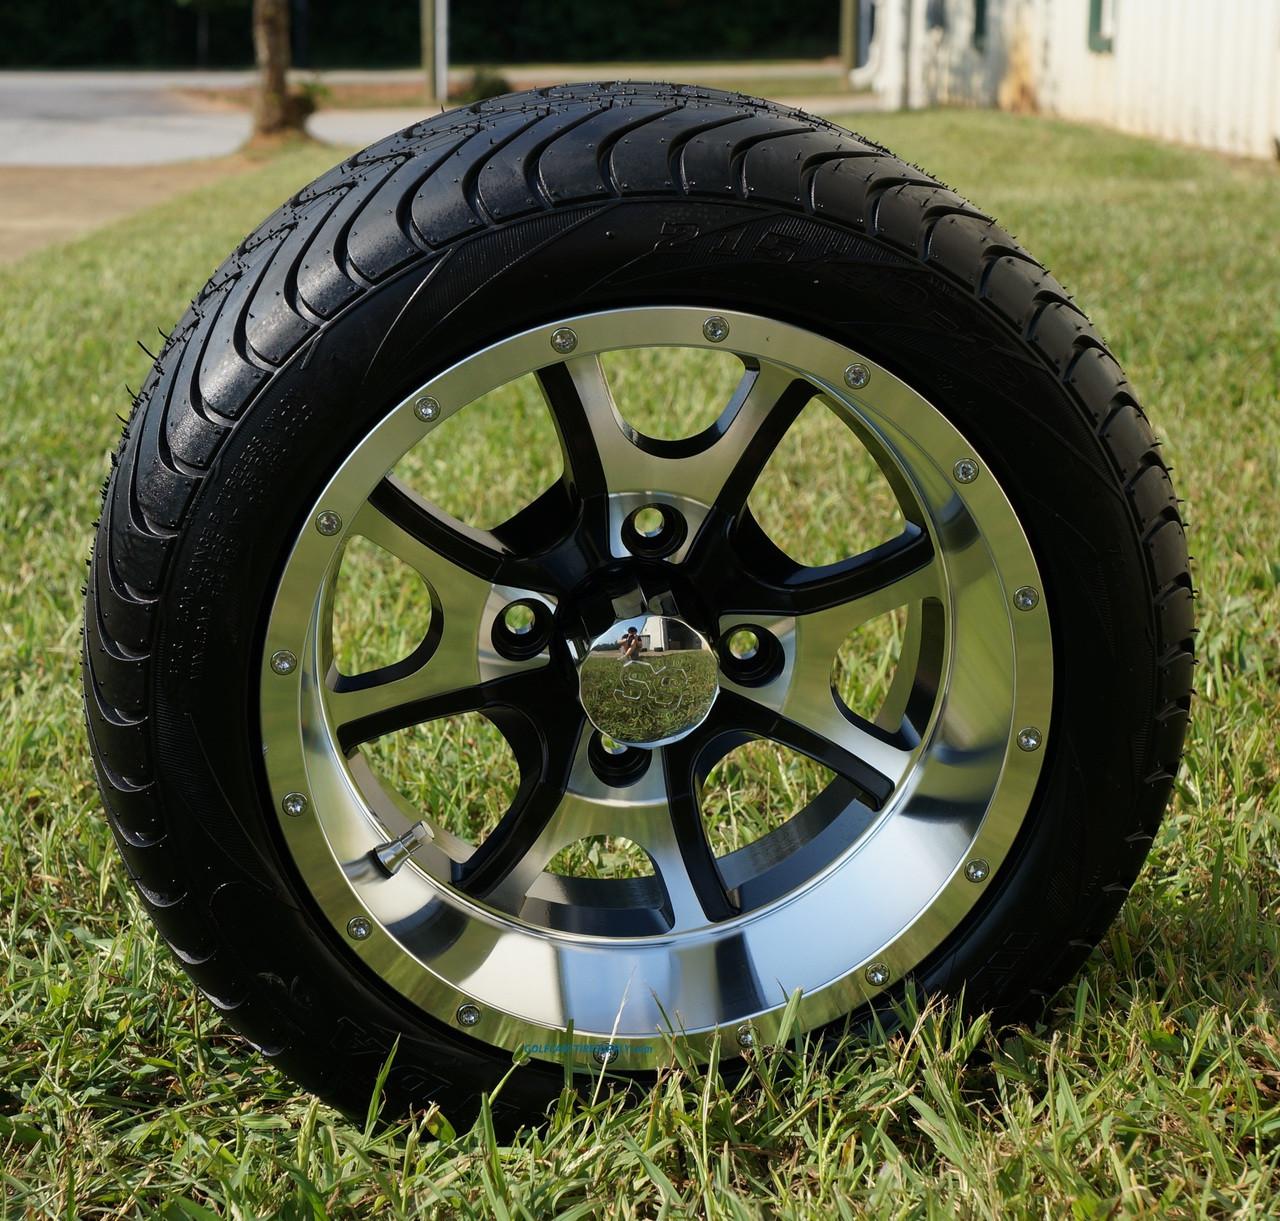 12 predator golf cart wheels and 215 40 12 low profile dot golf cart tires golf cart tire supply. Black Bedroom Furniture Sets. Home Design Ideas